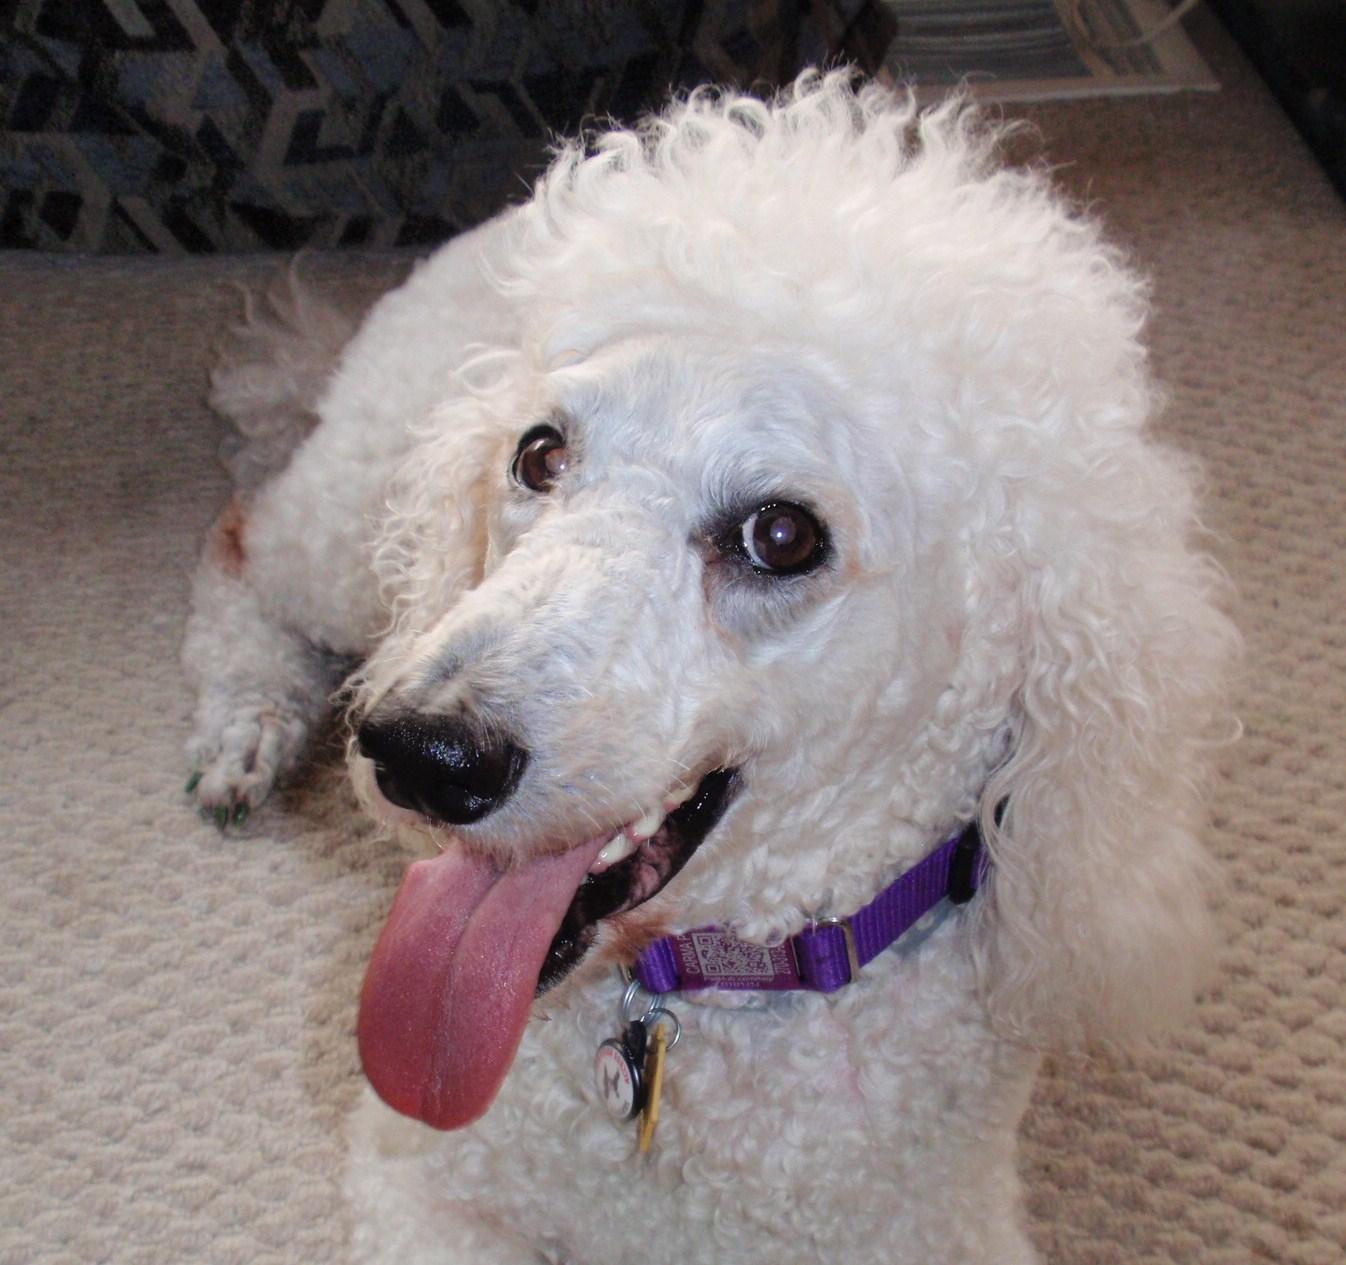 PetHub collar on Carma Poodale- standard Poodle